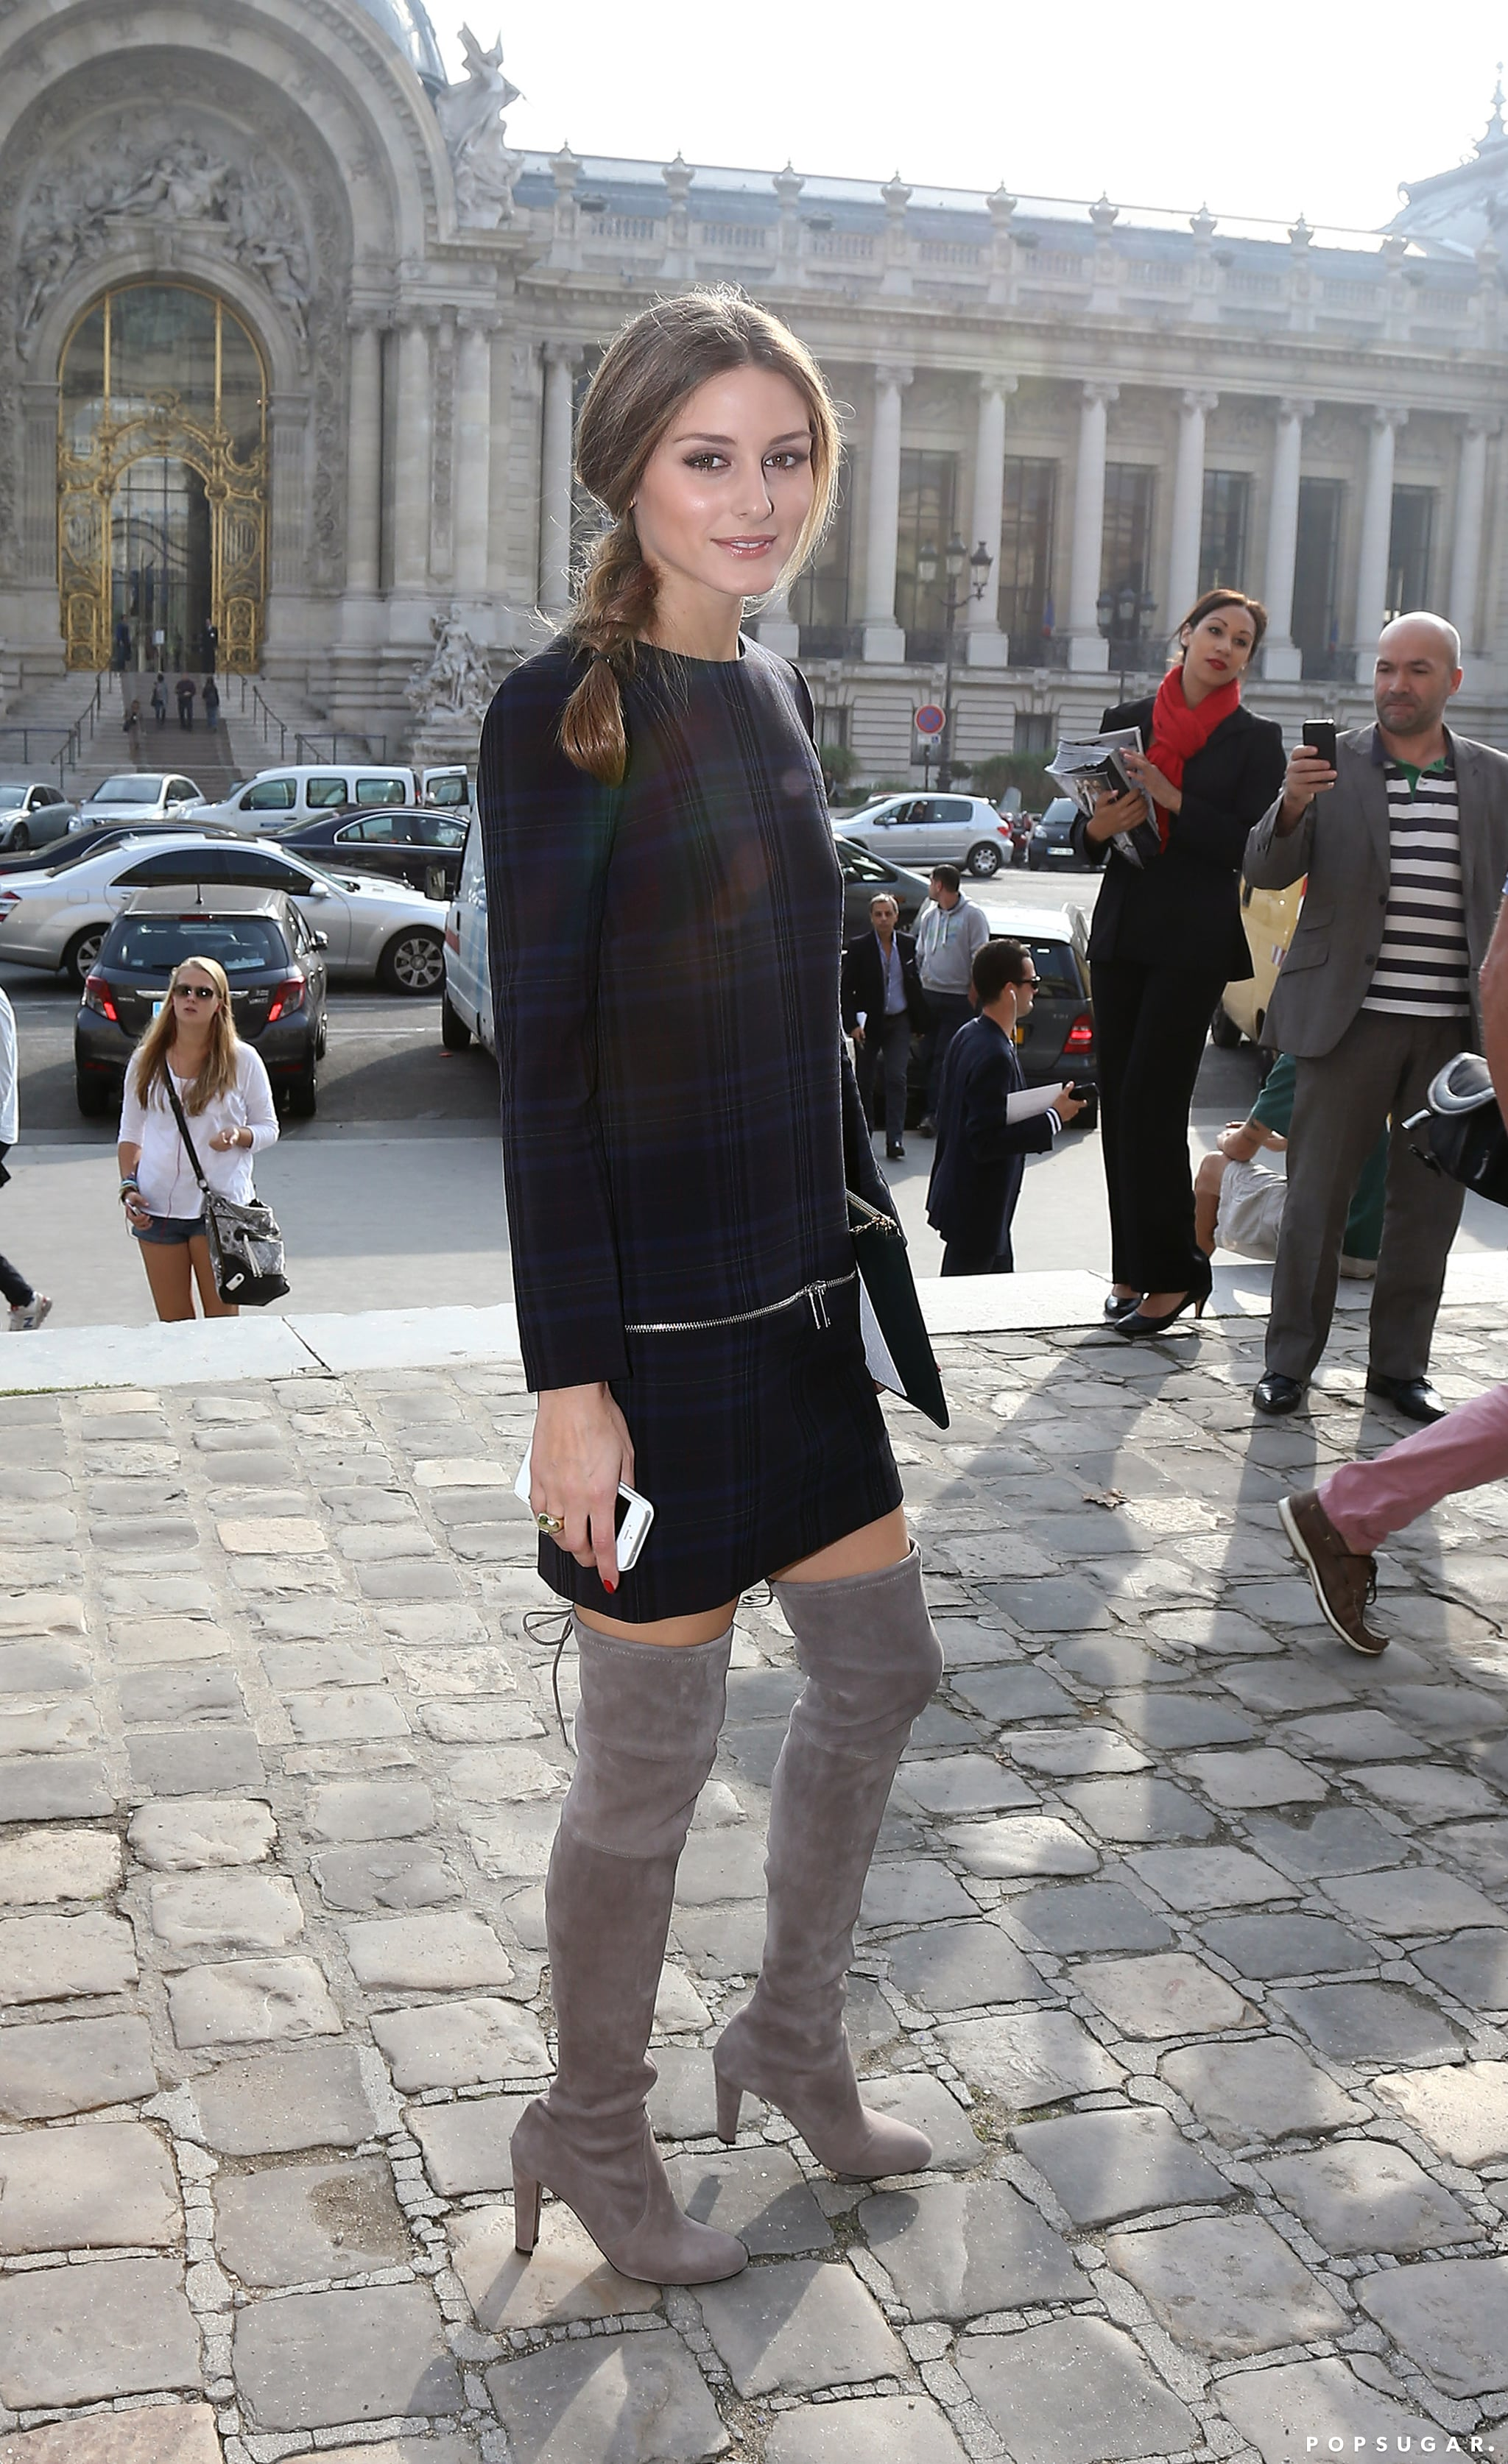 Celebrities Wearing Over-the-Knee Boots